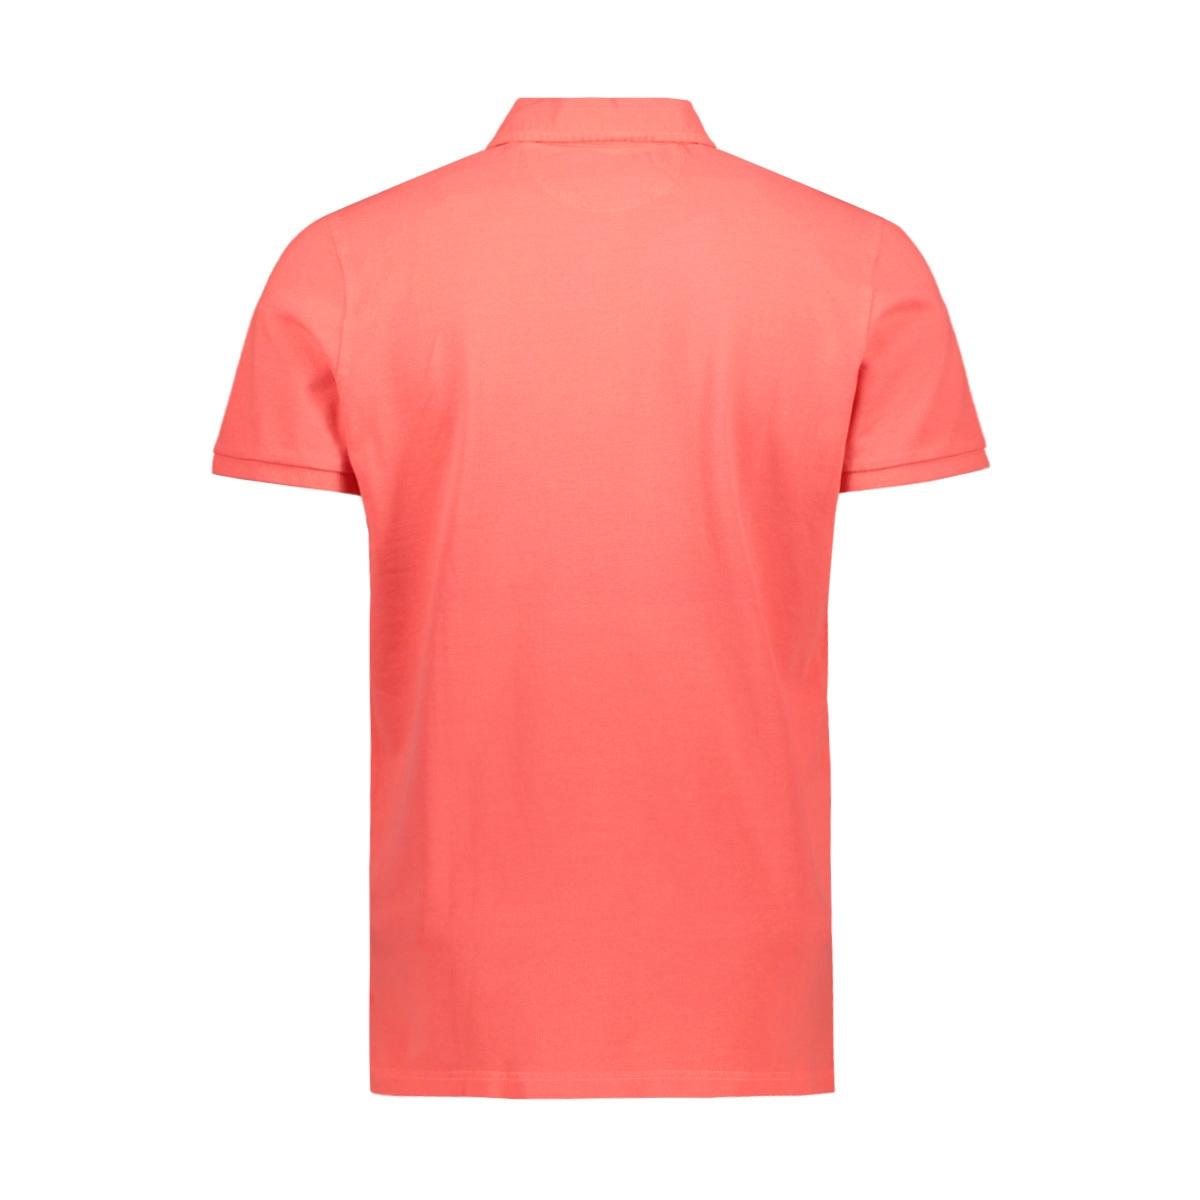 waiapu 19cn150 nza polo 638 neon orange